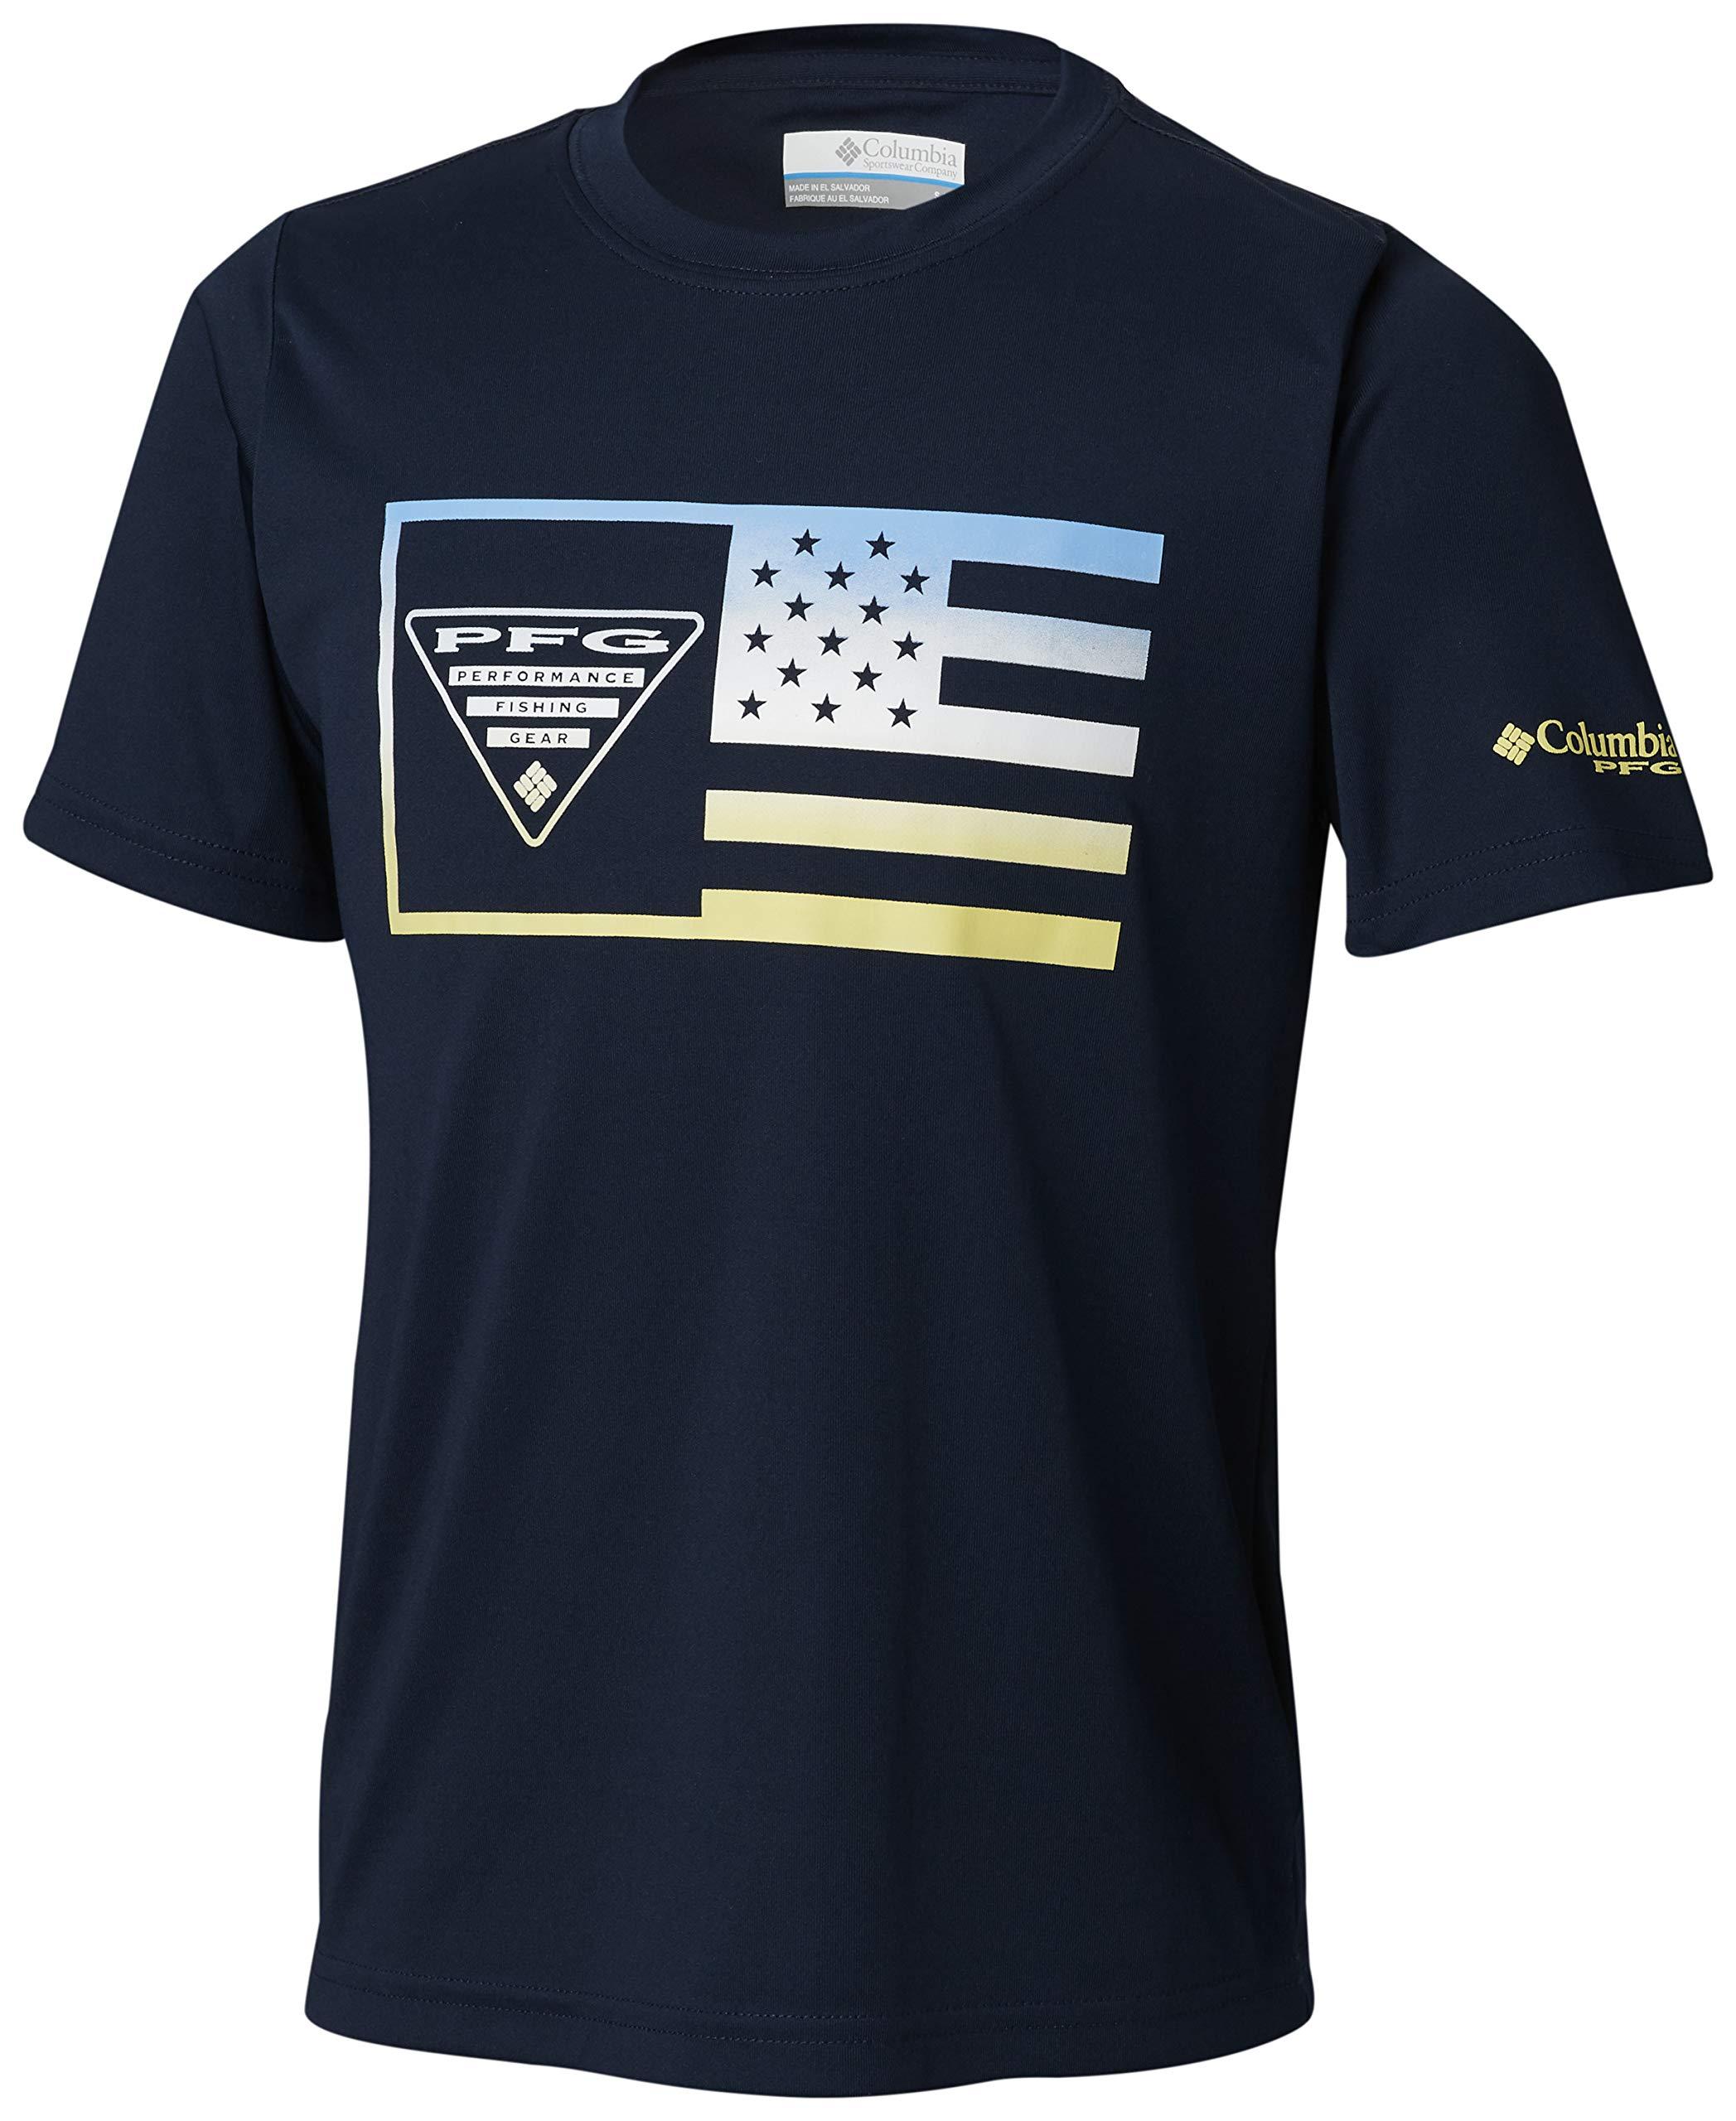 Columbia Boys PFGStamp Short Sleeve Shirt, Collegiate Navy Flag, Large